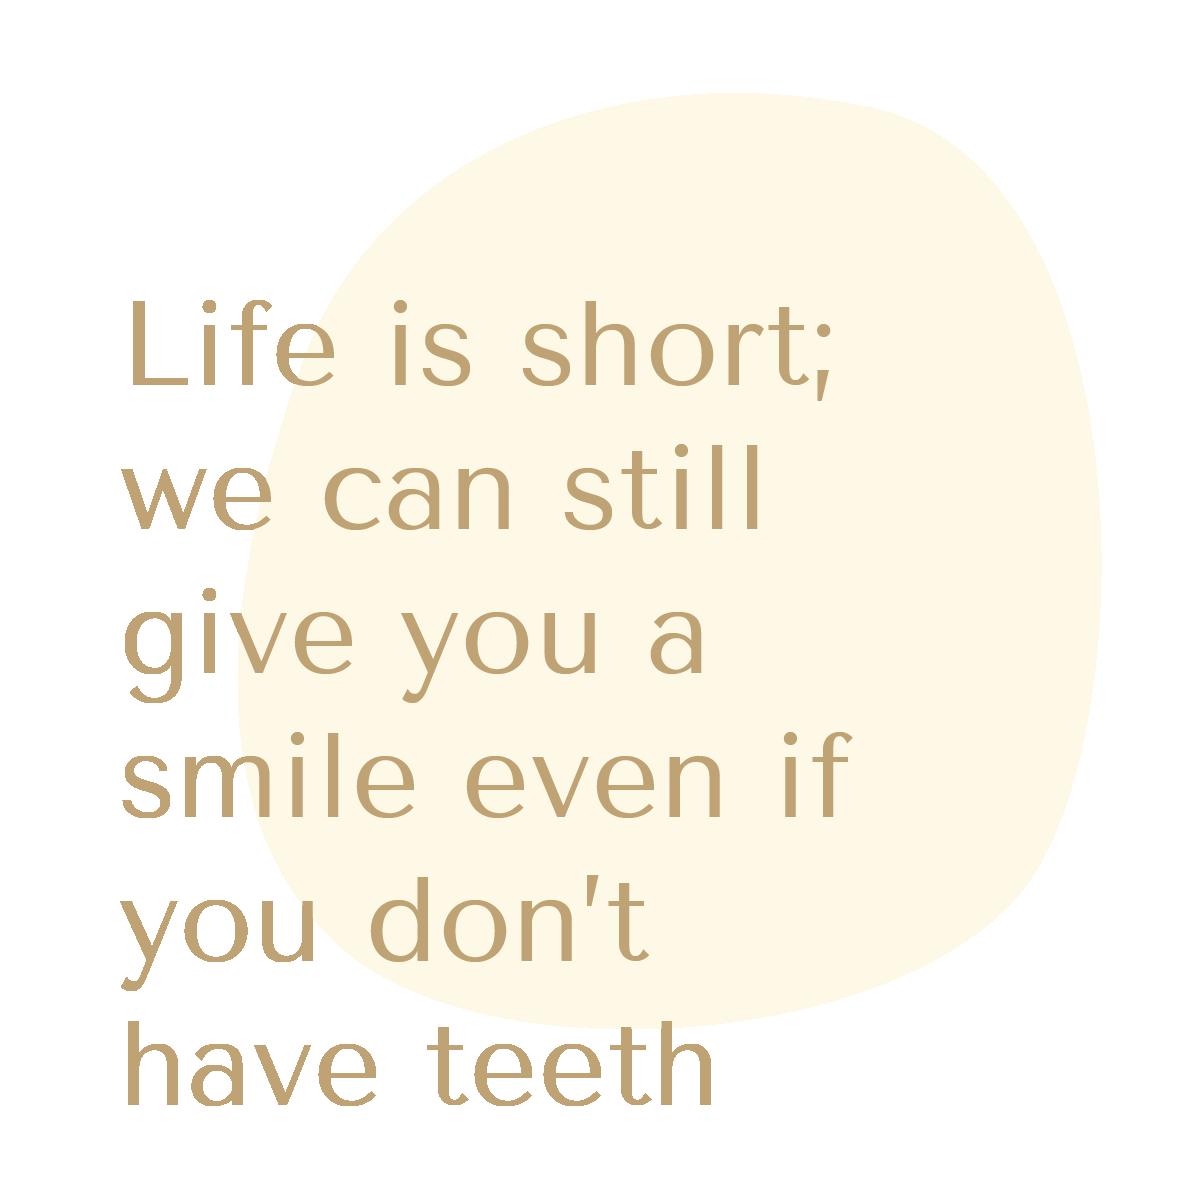 surry hills dental dentures quote